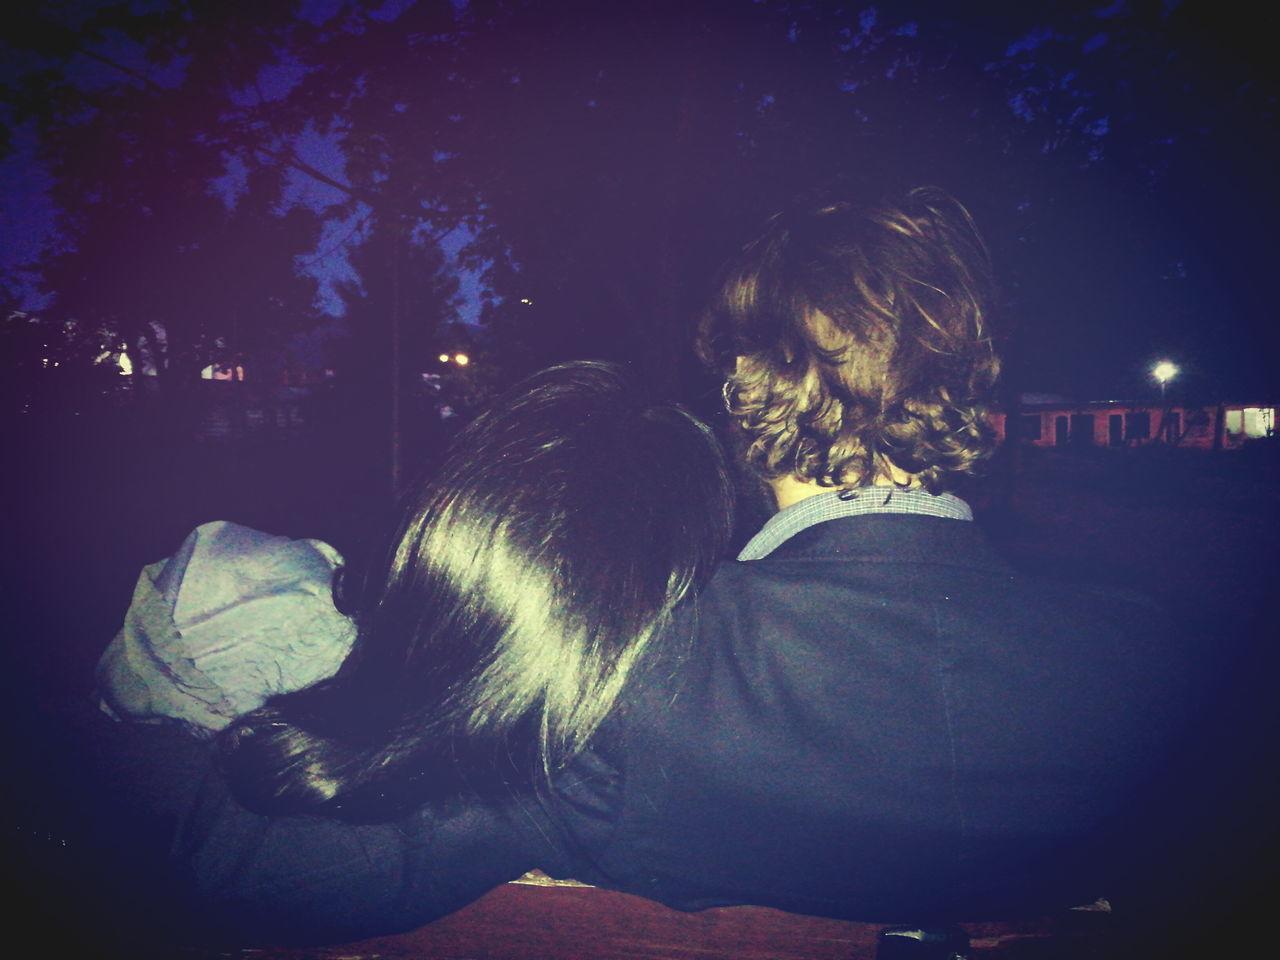 Couple in love Romance Night Love ♥ Romantic Couple Couple - Relationship Lovelovelove